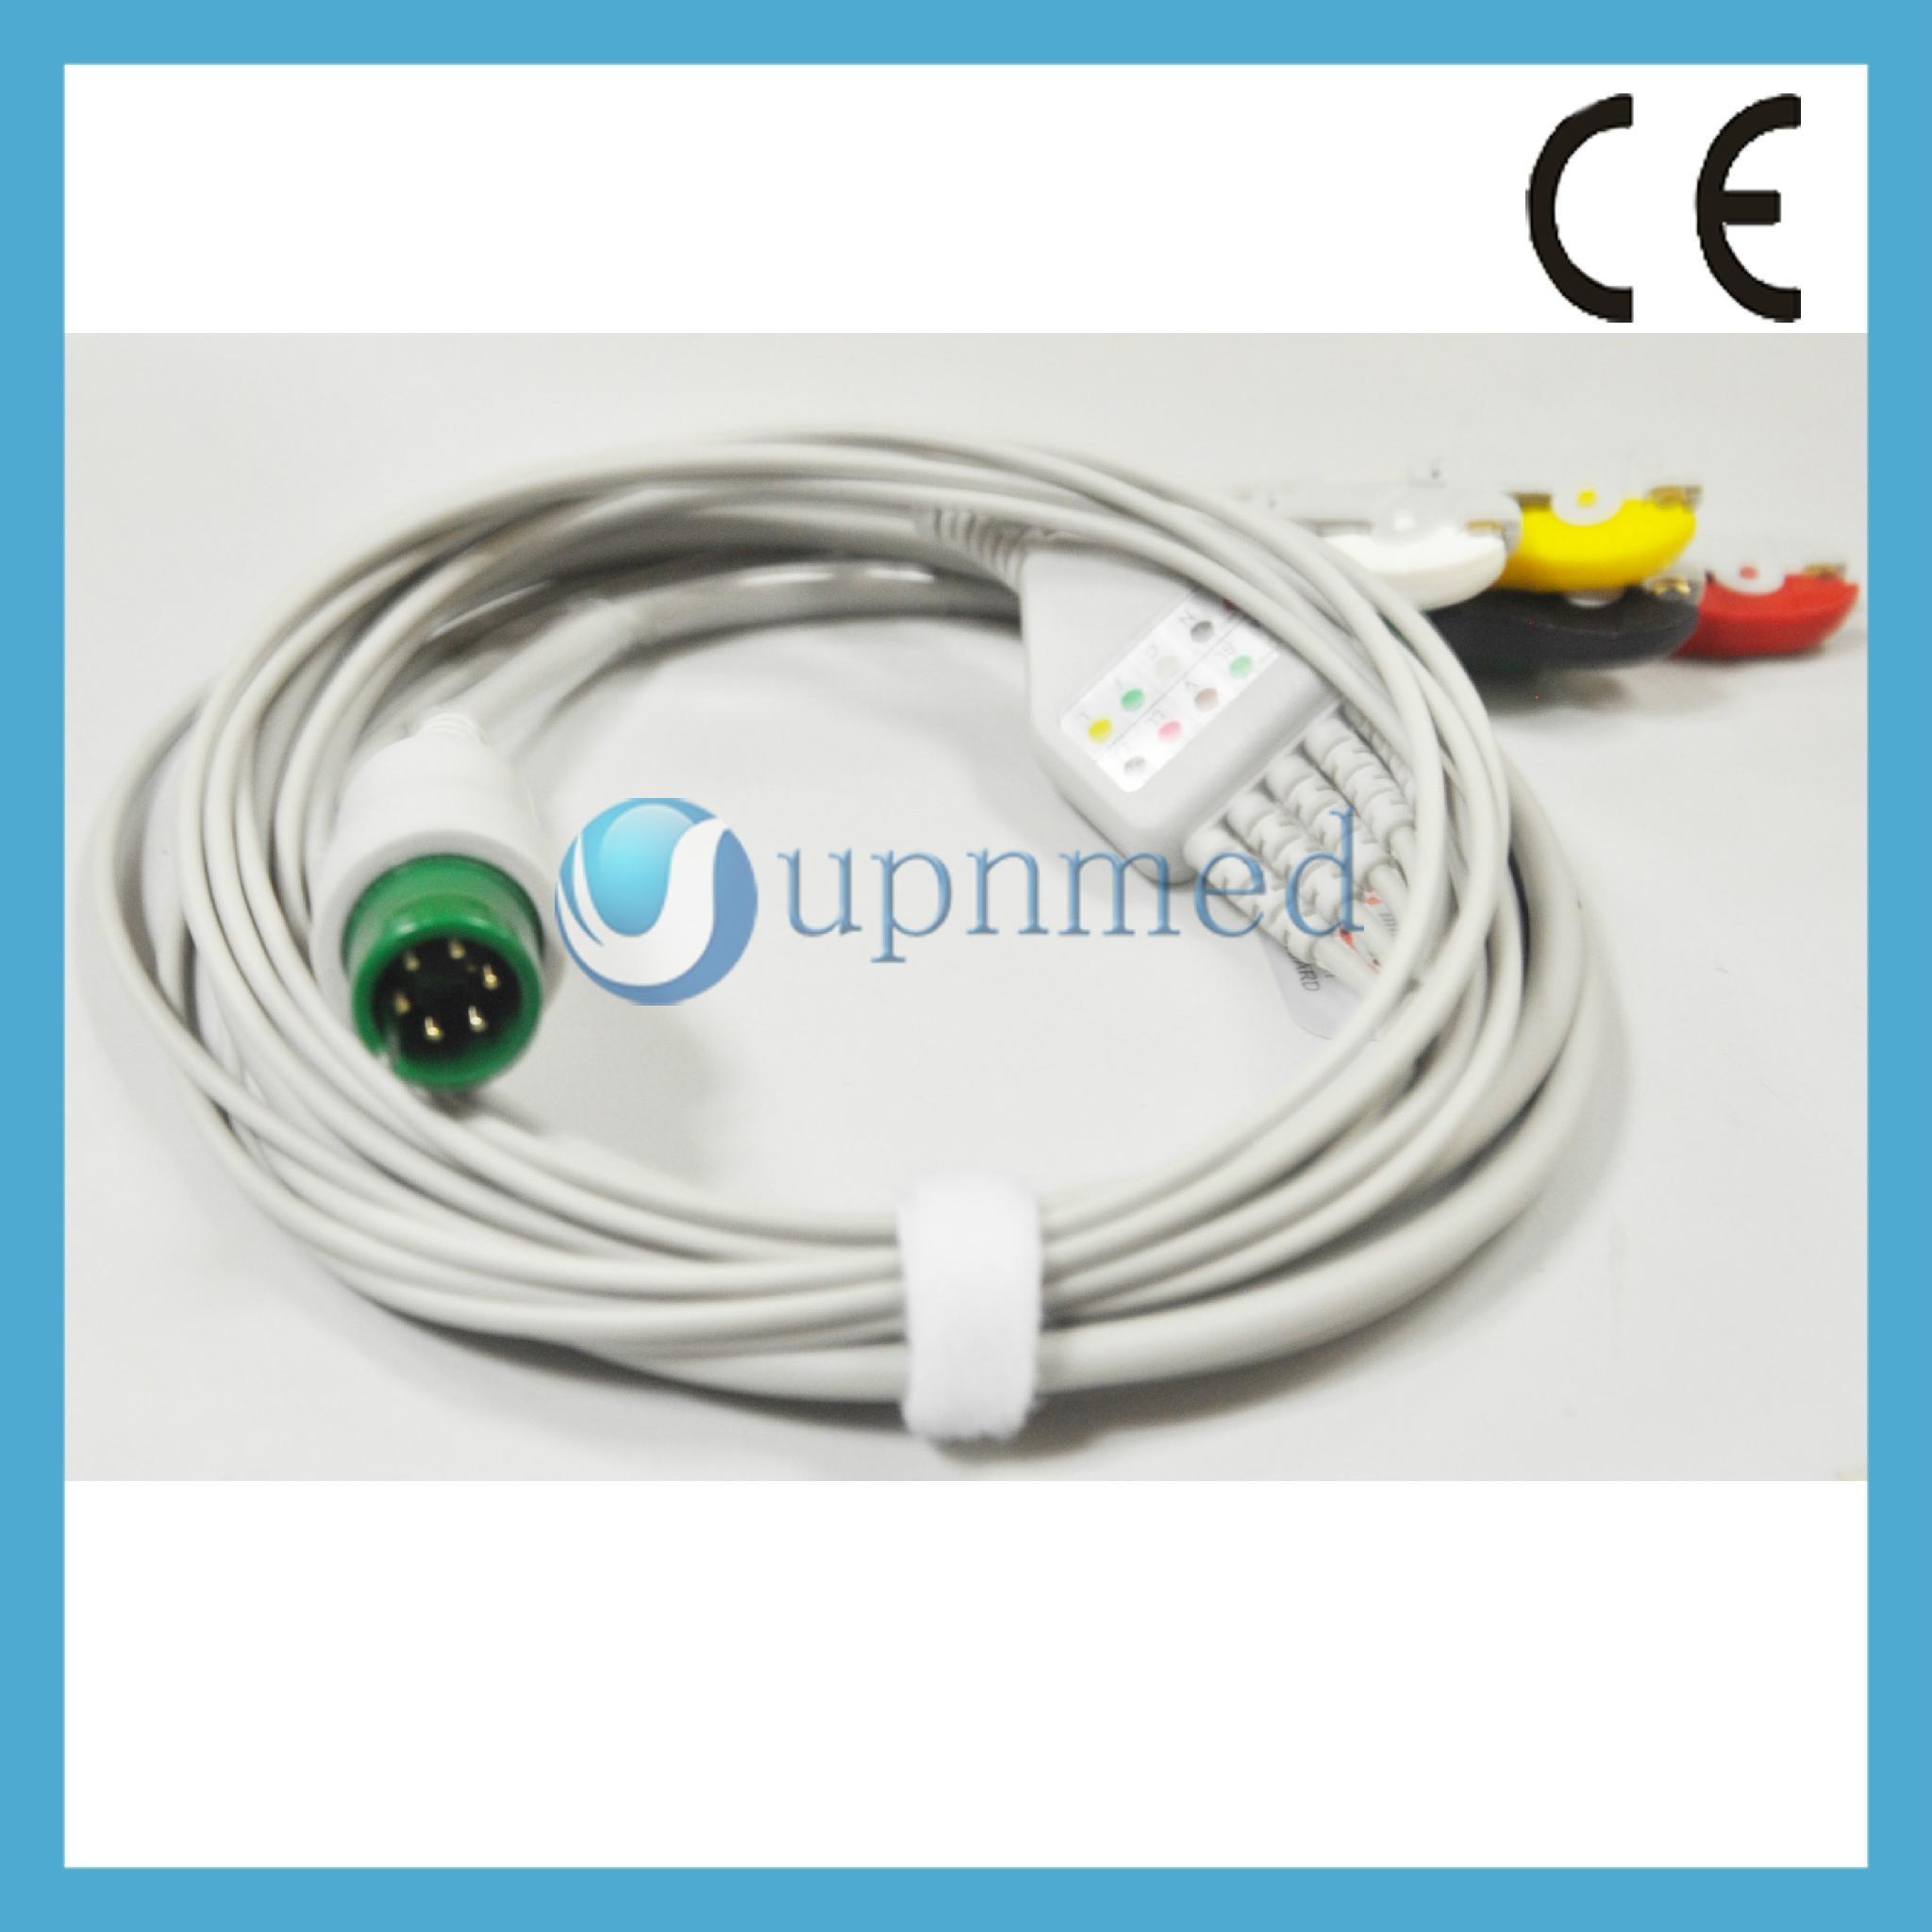 MEK ECG Cable